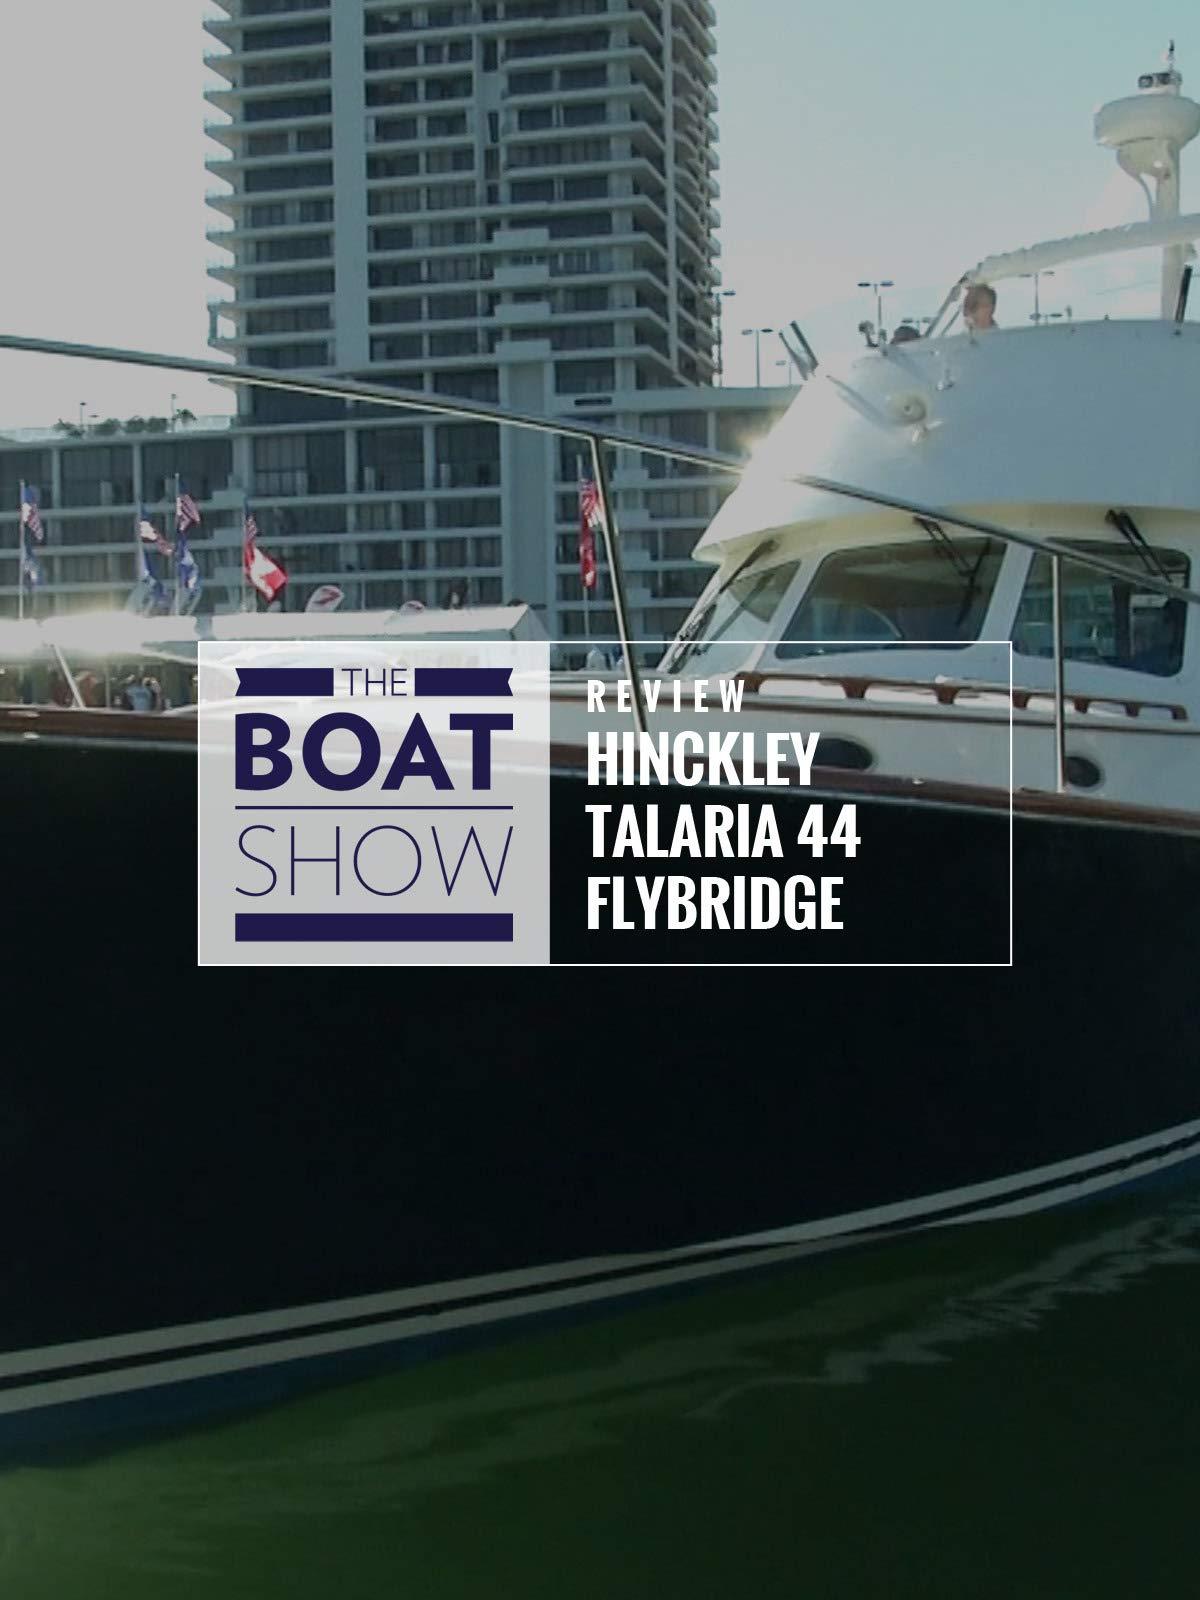 Review: Hinckley Talaria 44 Flybridge on Amazon Prime Instant Video UK